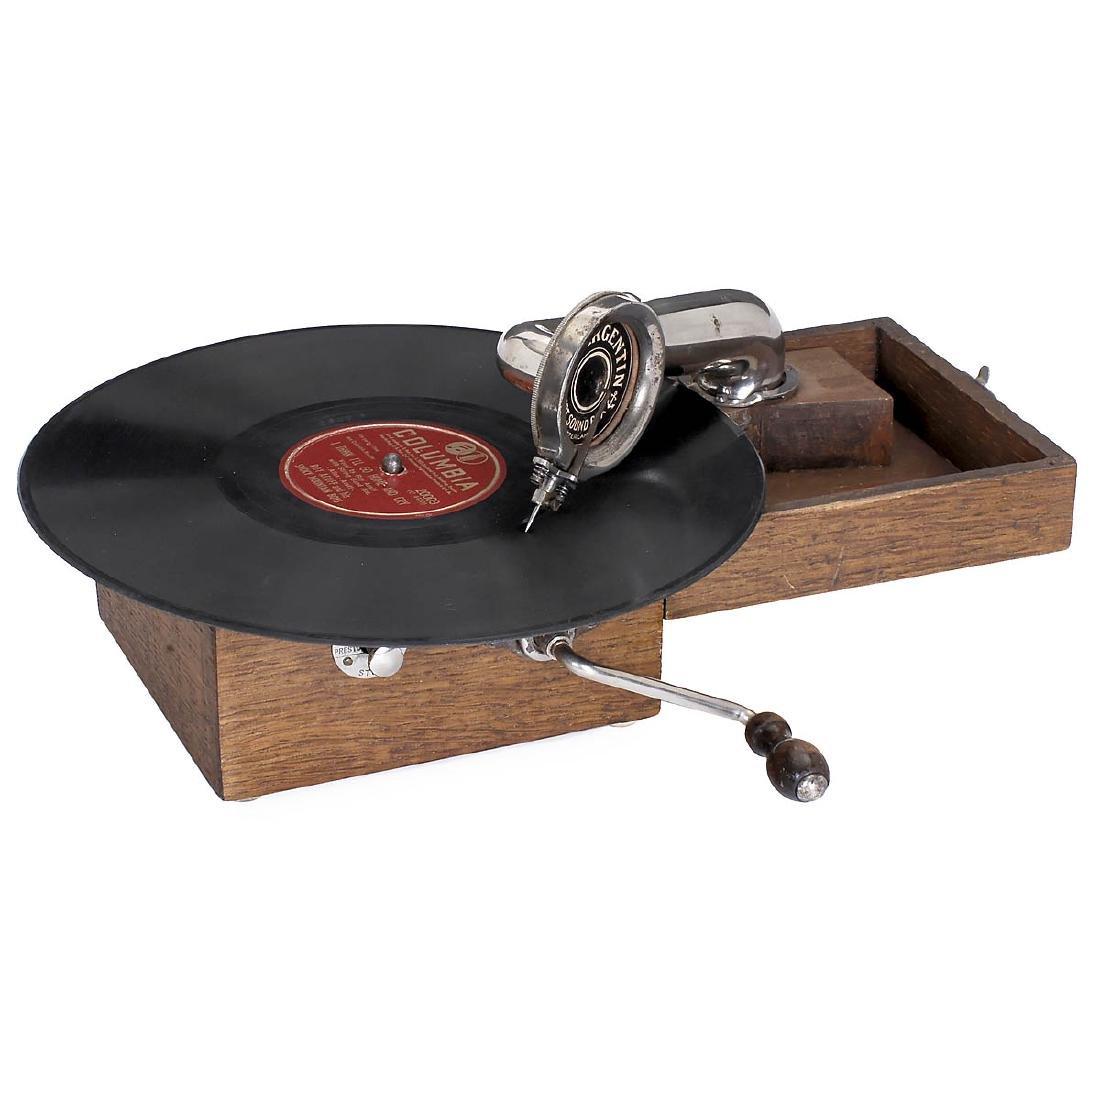 The Sphinx Phonograph, c. 1925